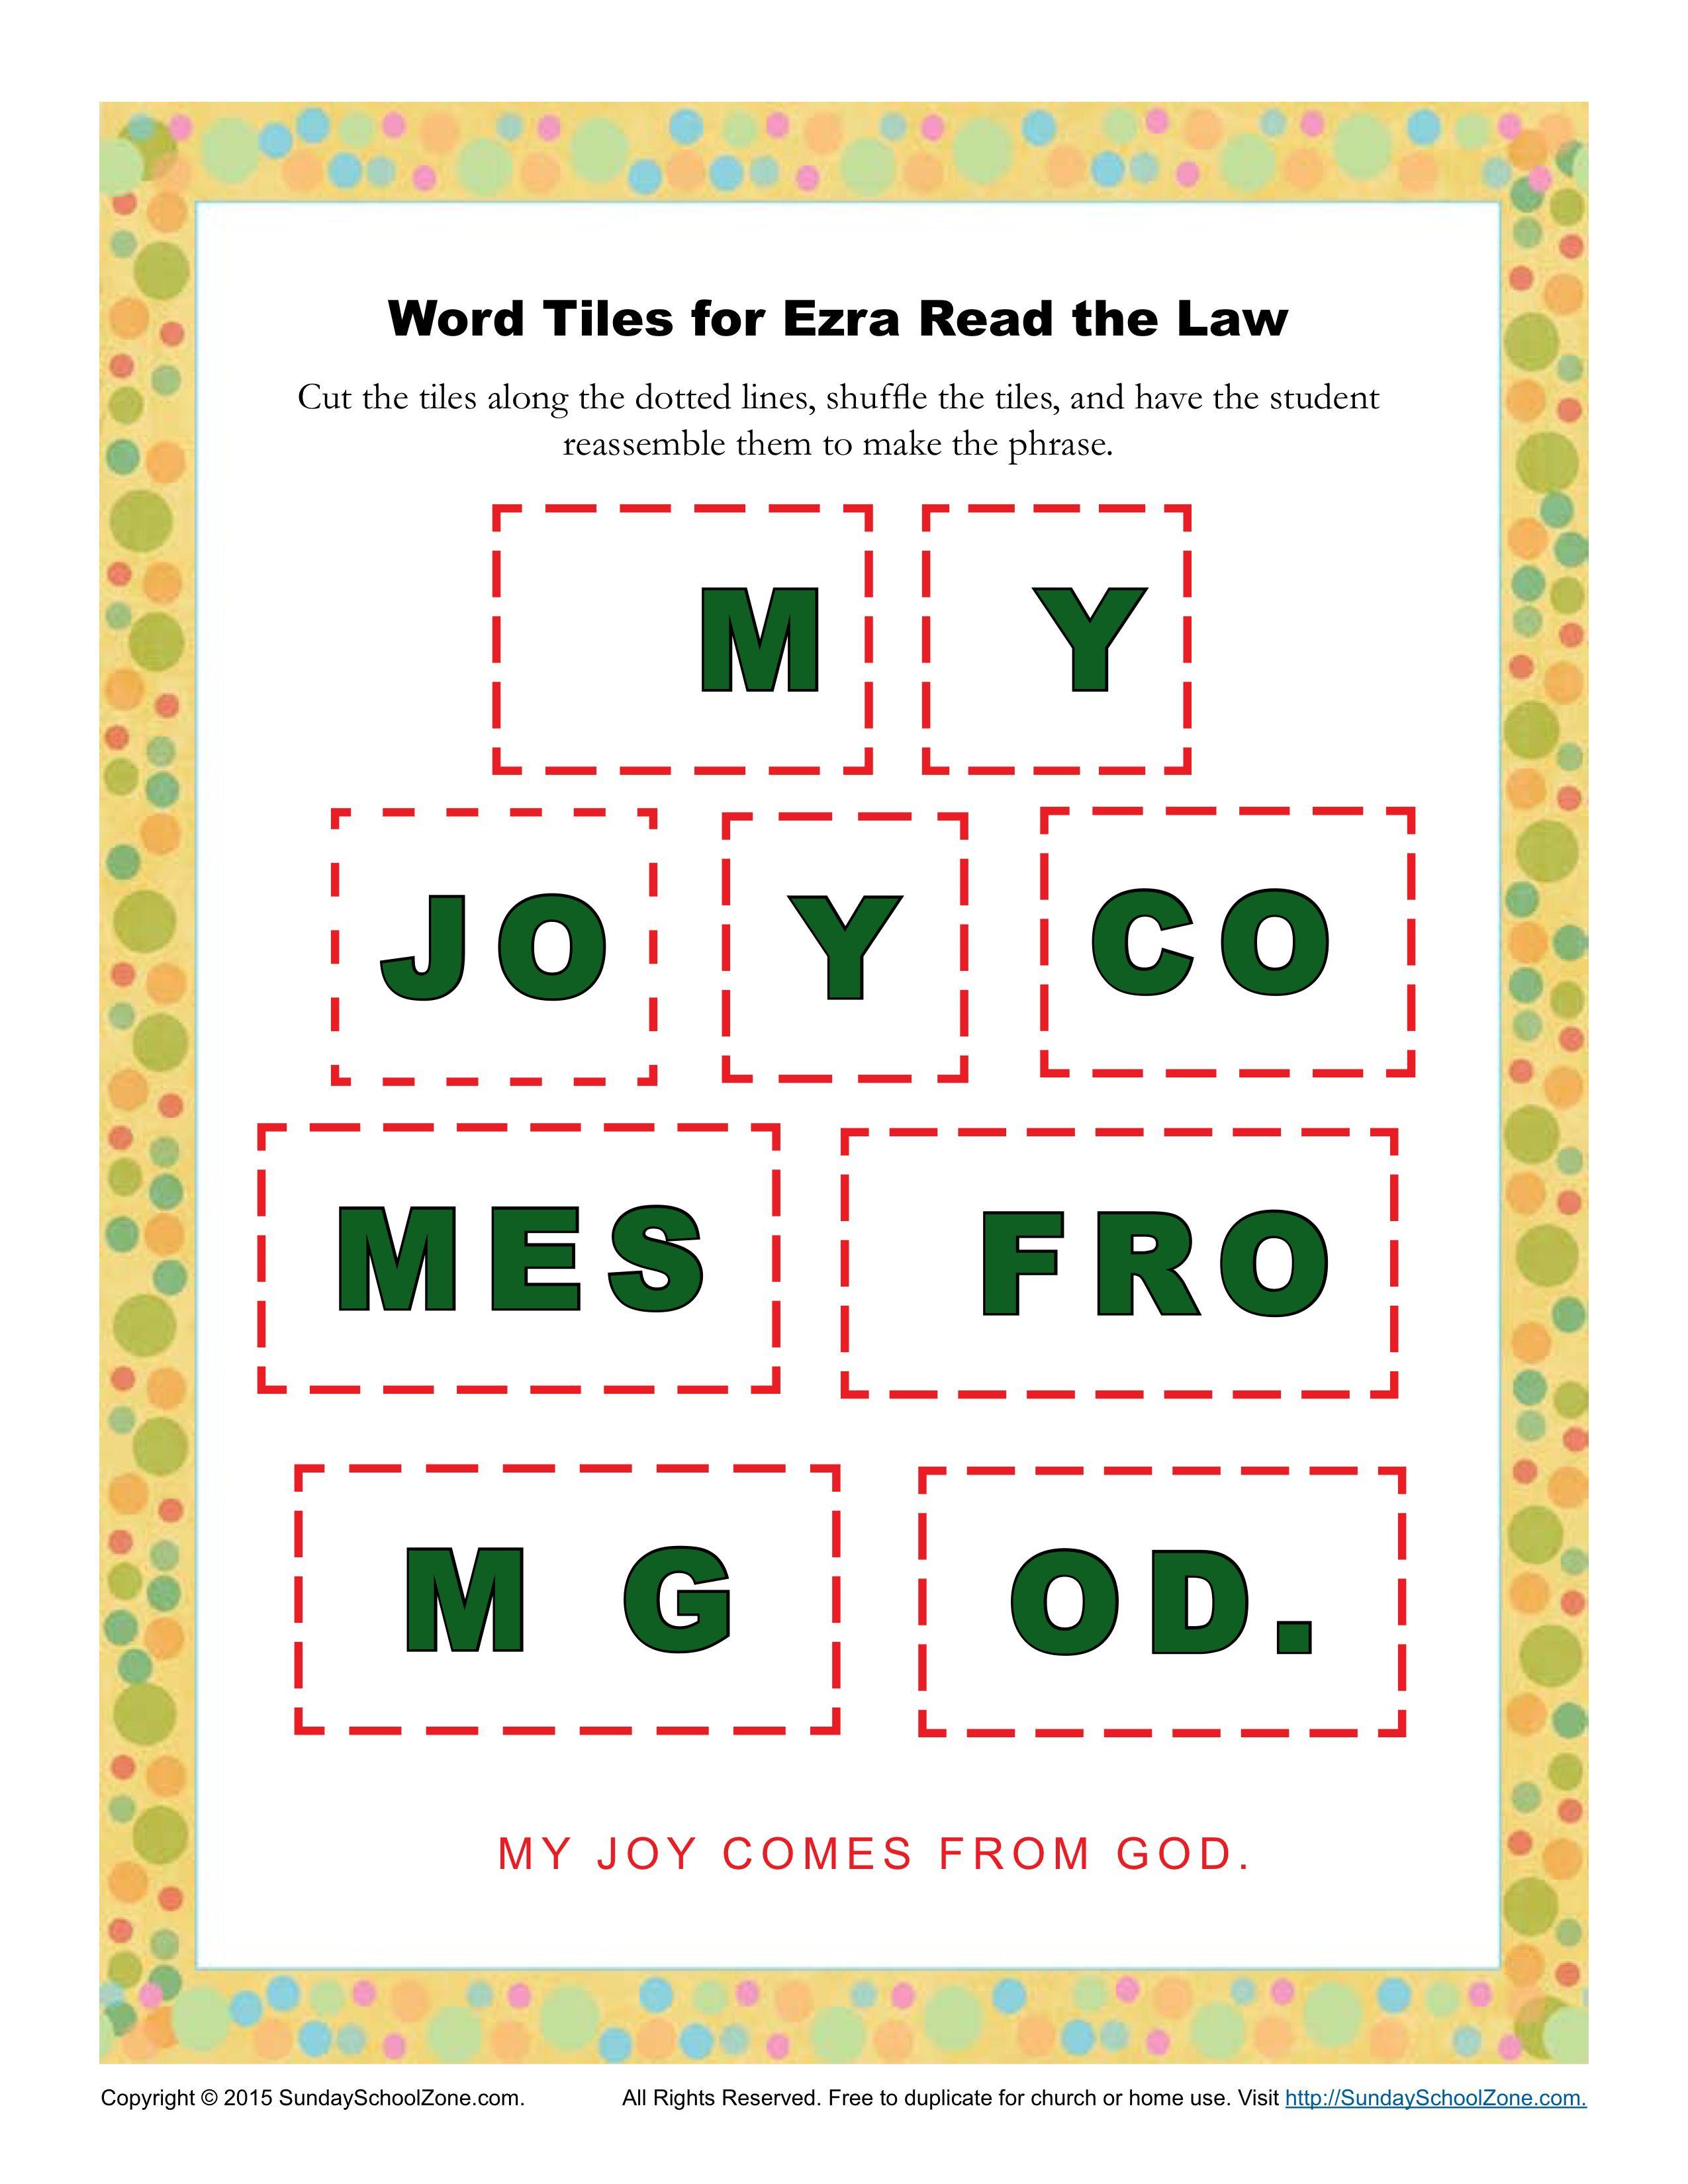 Ezra Read The Law Word Tiles